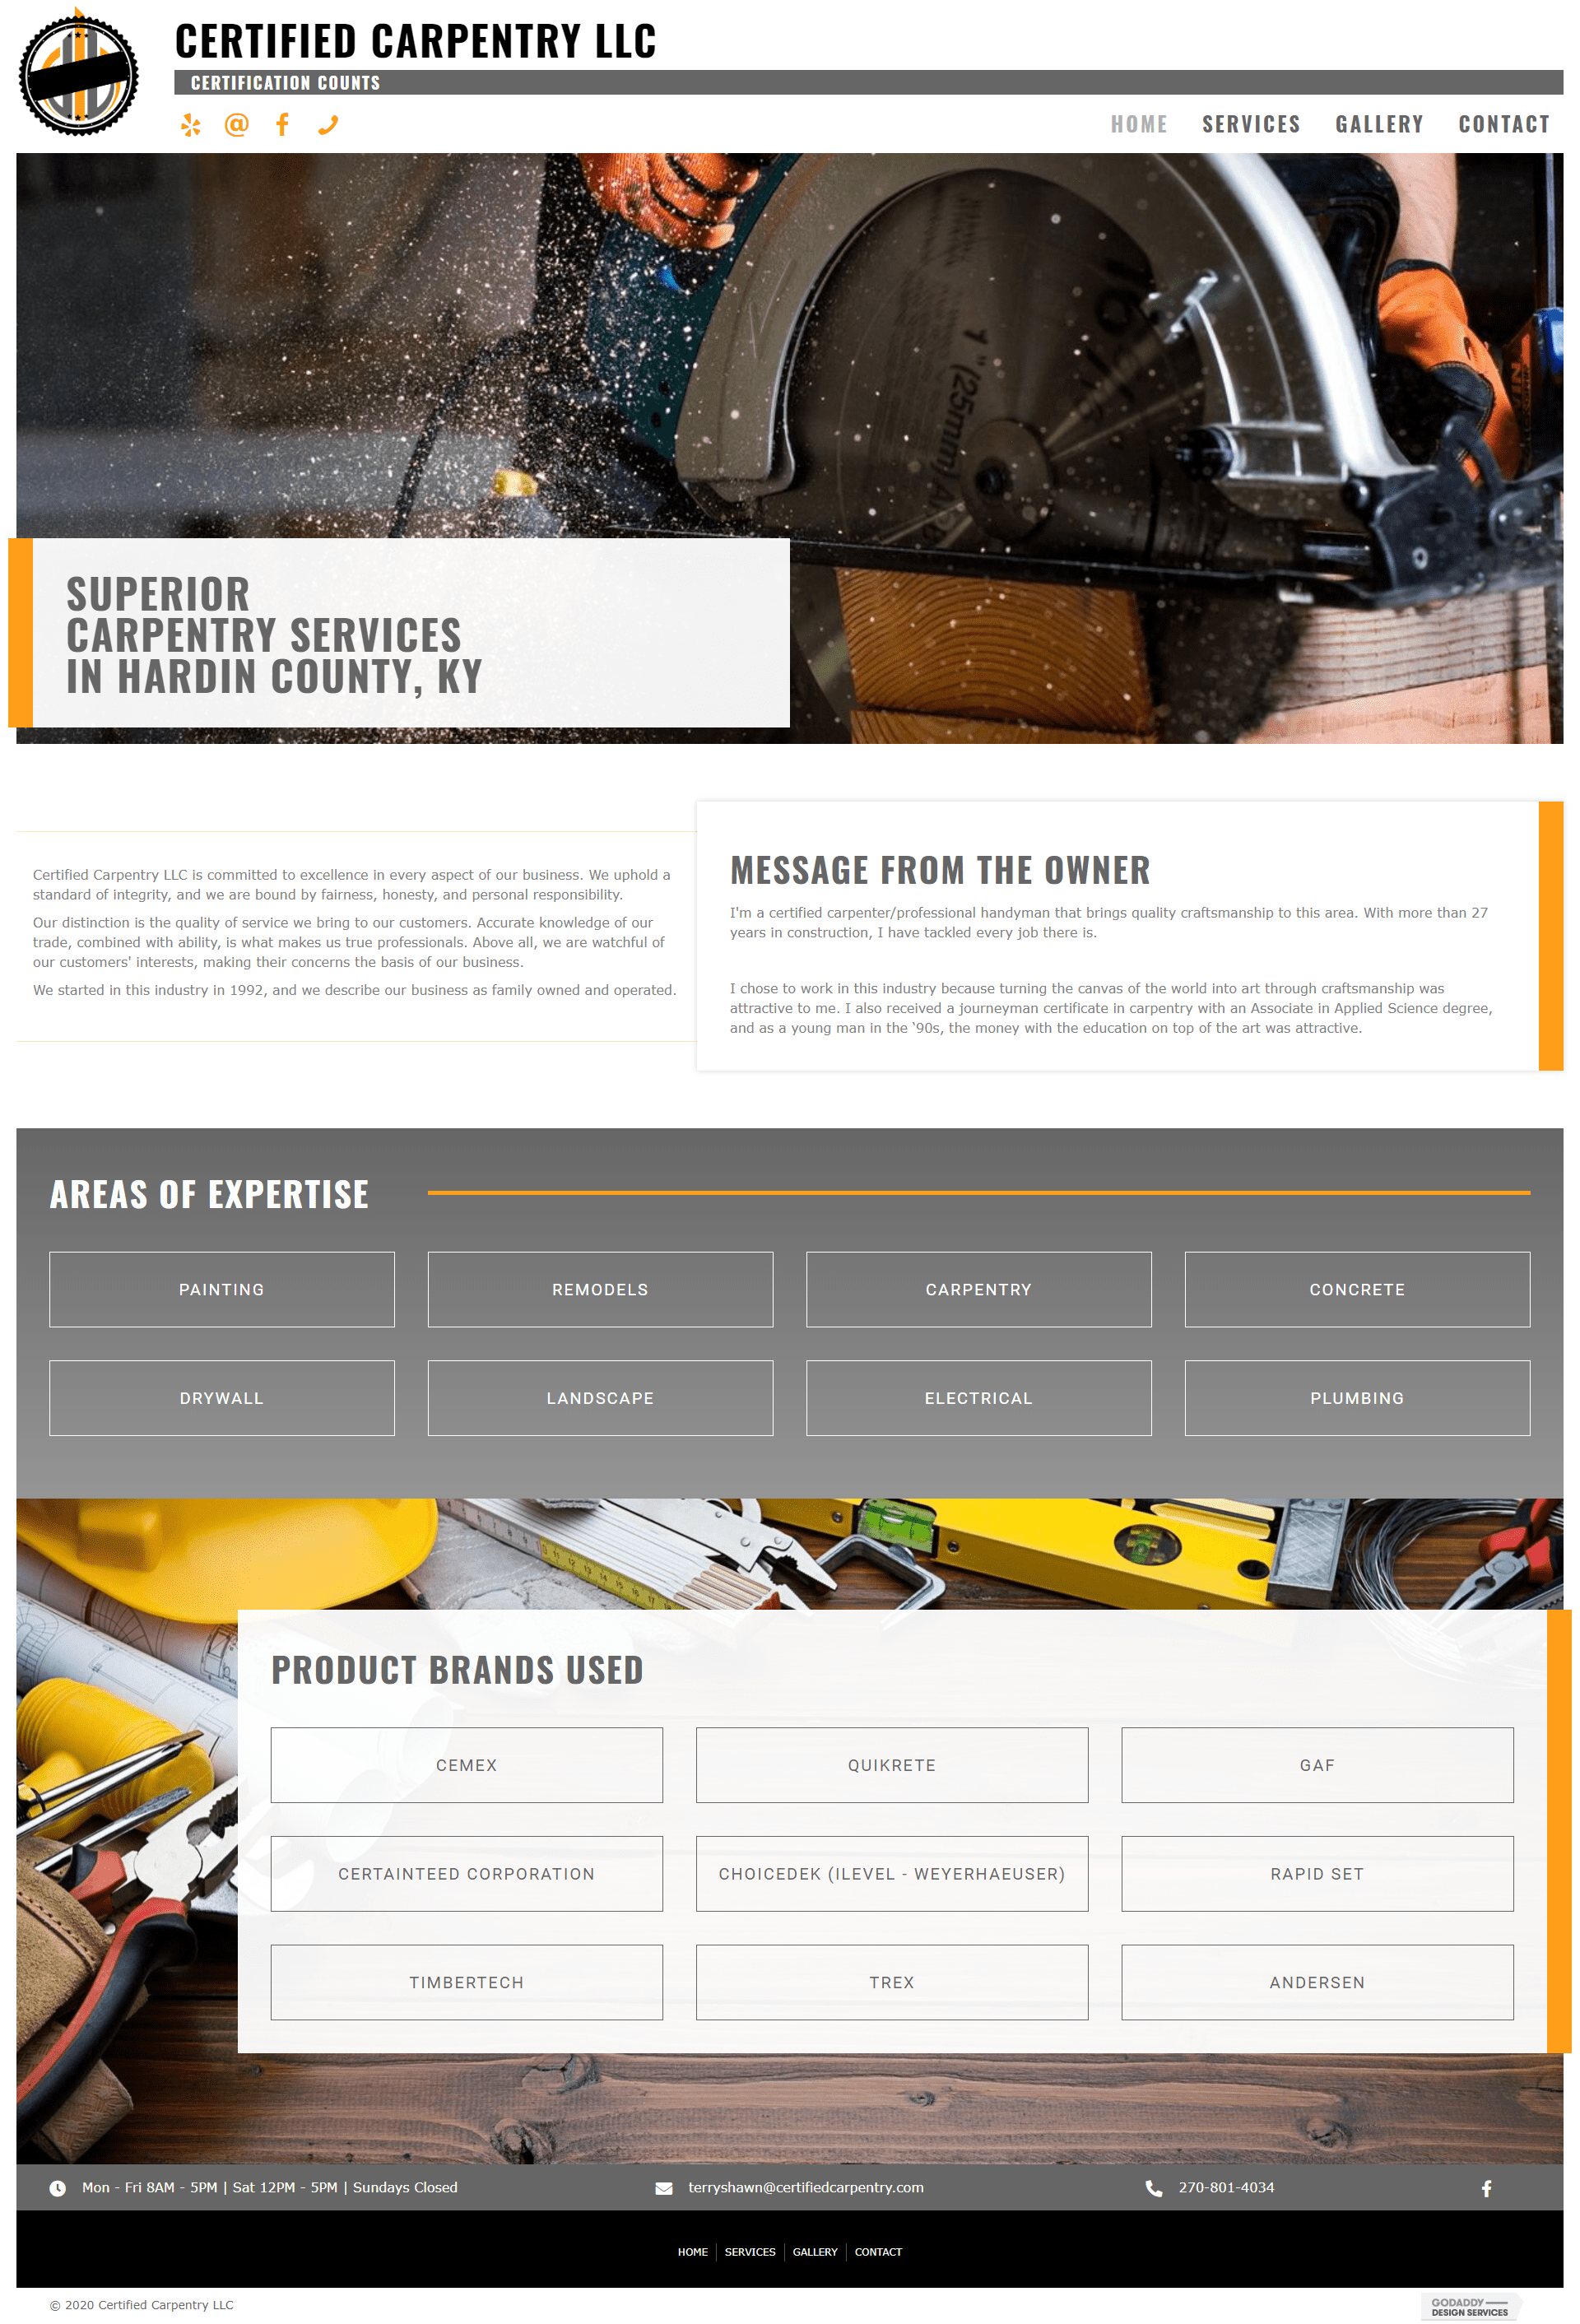 screencapture-36c-ae0-myftpupload-Certified Carpentry LLC-desktop